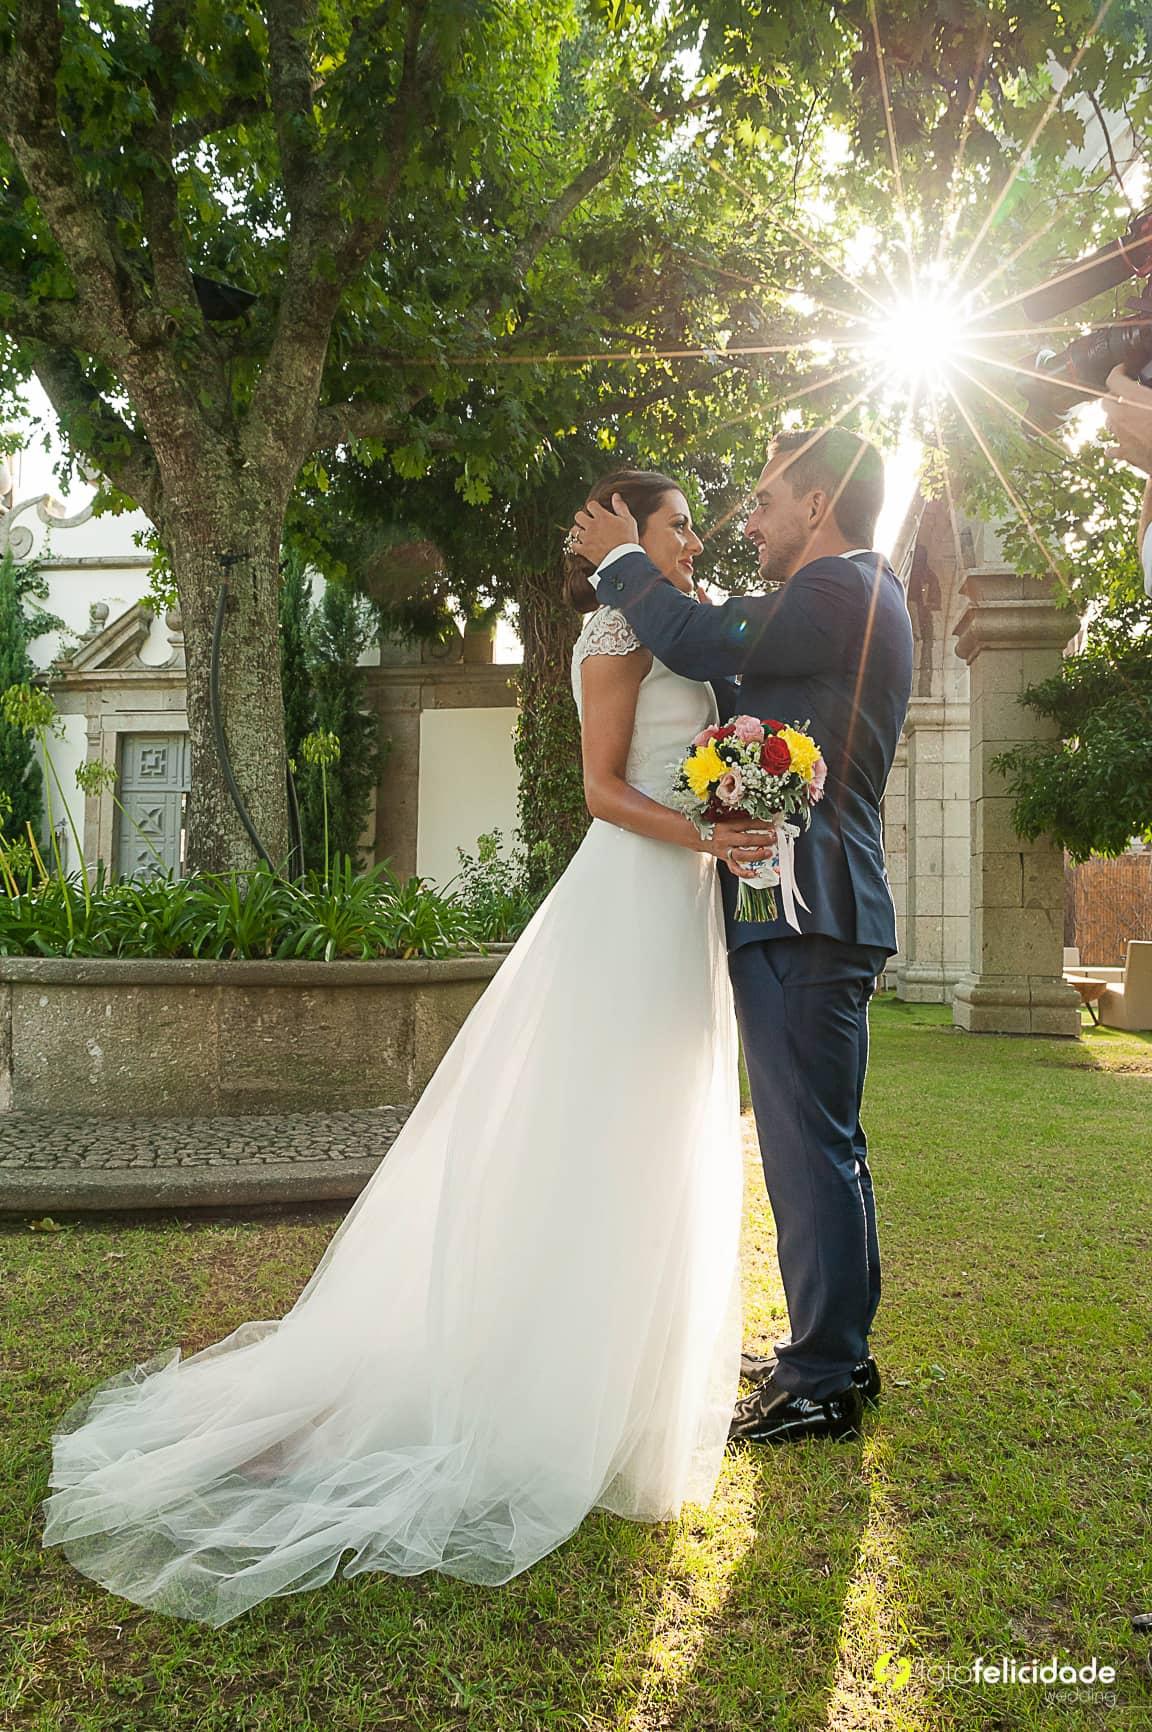 FF1_4328FF Foto Felicidade Wedding Sofia Miguel